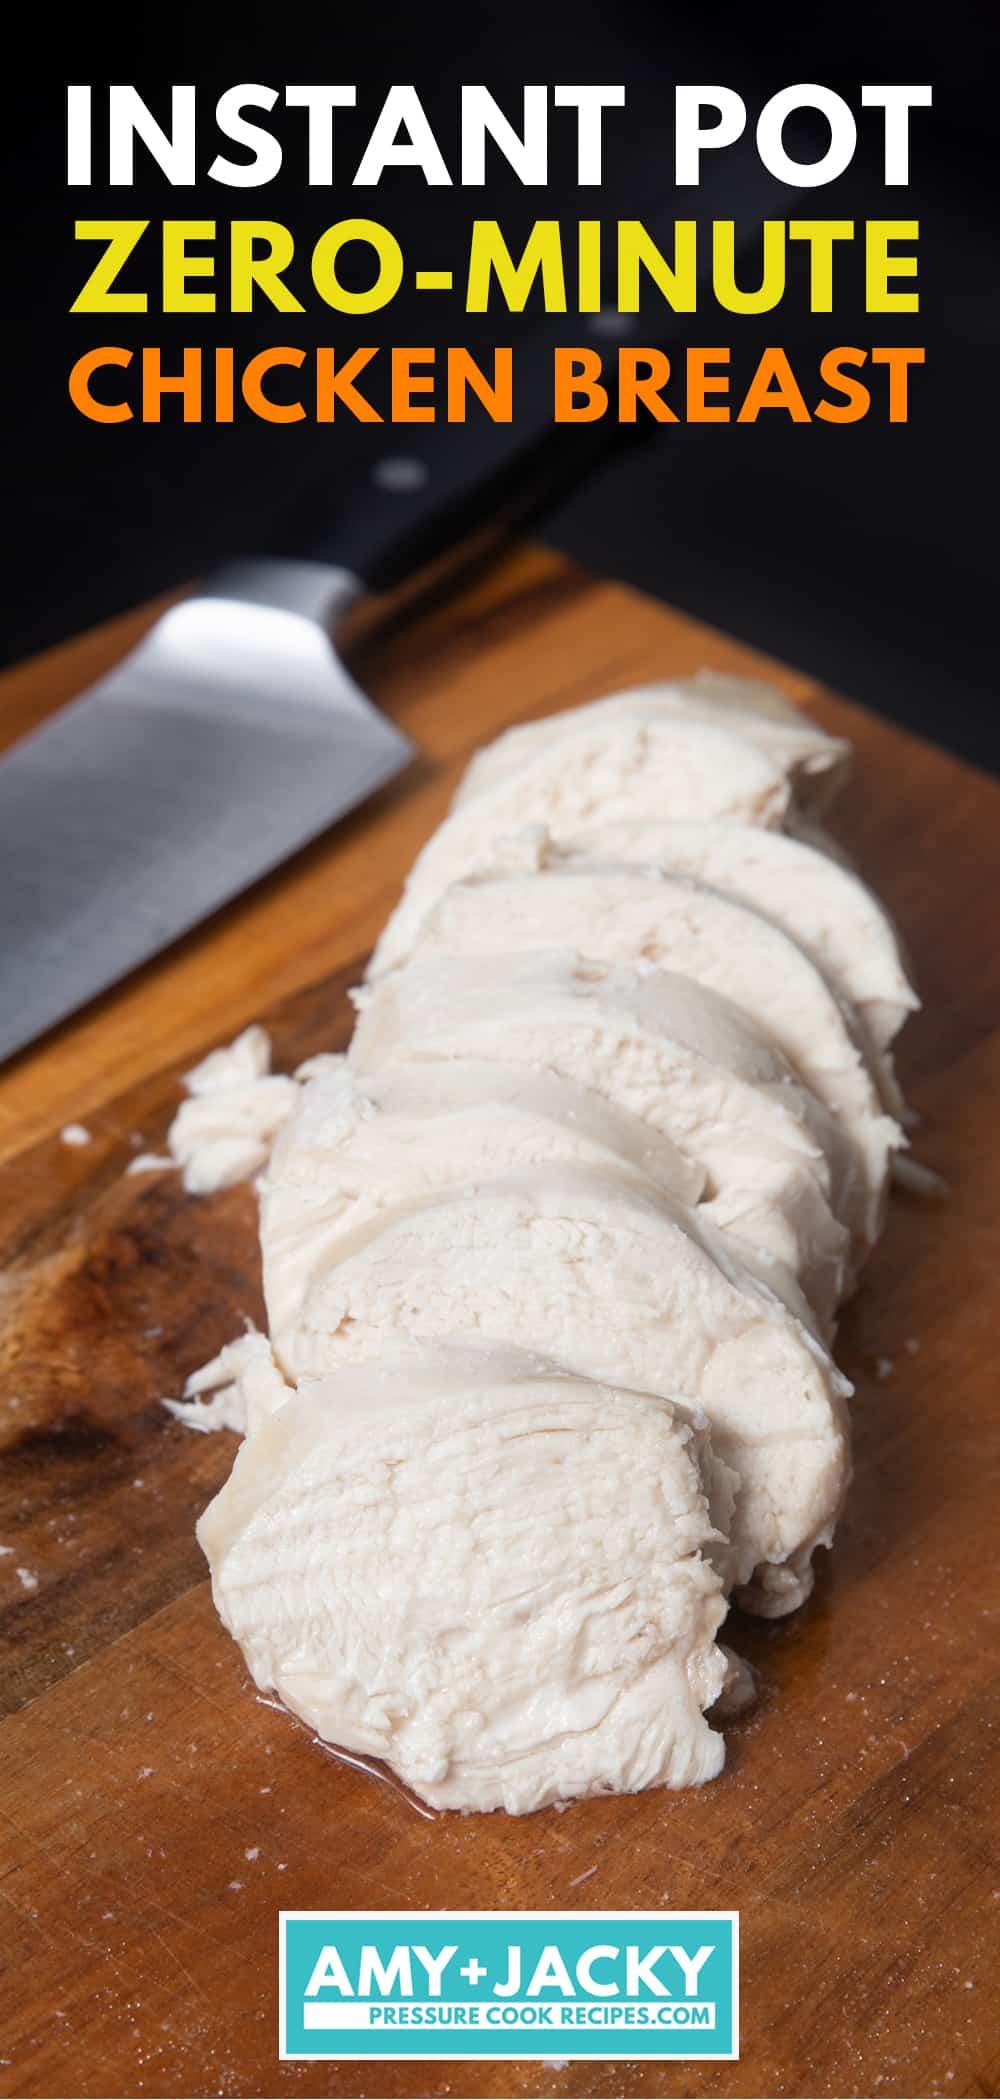 Instant-Topf Hühnerbrust |  Hähnchenbrust Instant Pot |  Instant-Topf Hähnchenbrust |  Instant-Topf Hähnchenbrust Rezept |  Instant-Topf mit Hähnchenbrust ohne Knochen #AmyJacky #InstantPot #chicken #recipe